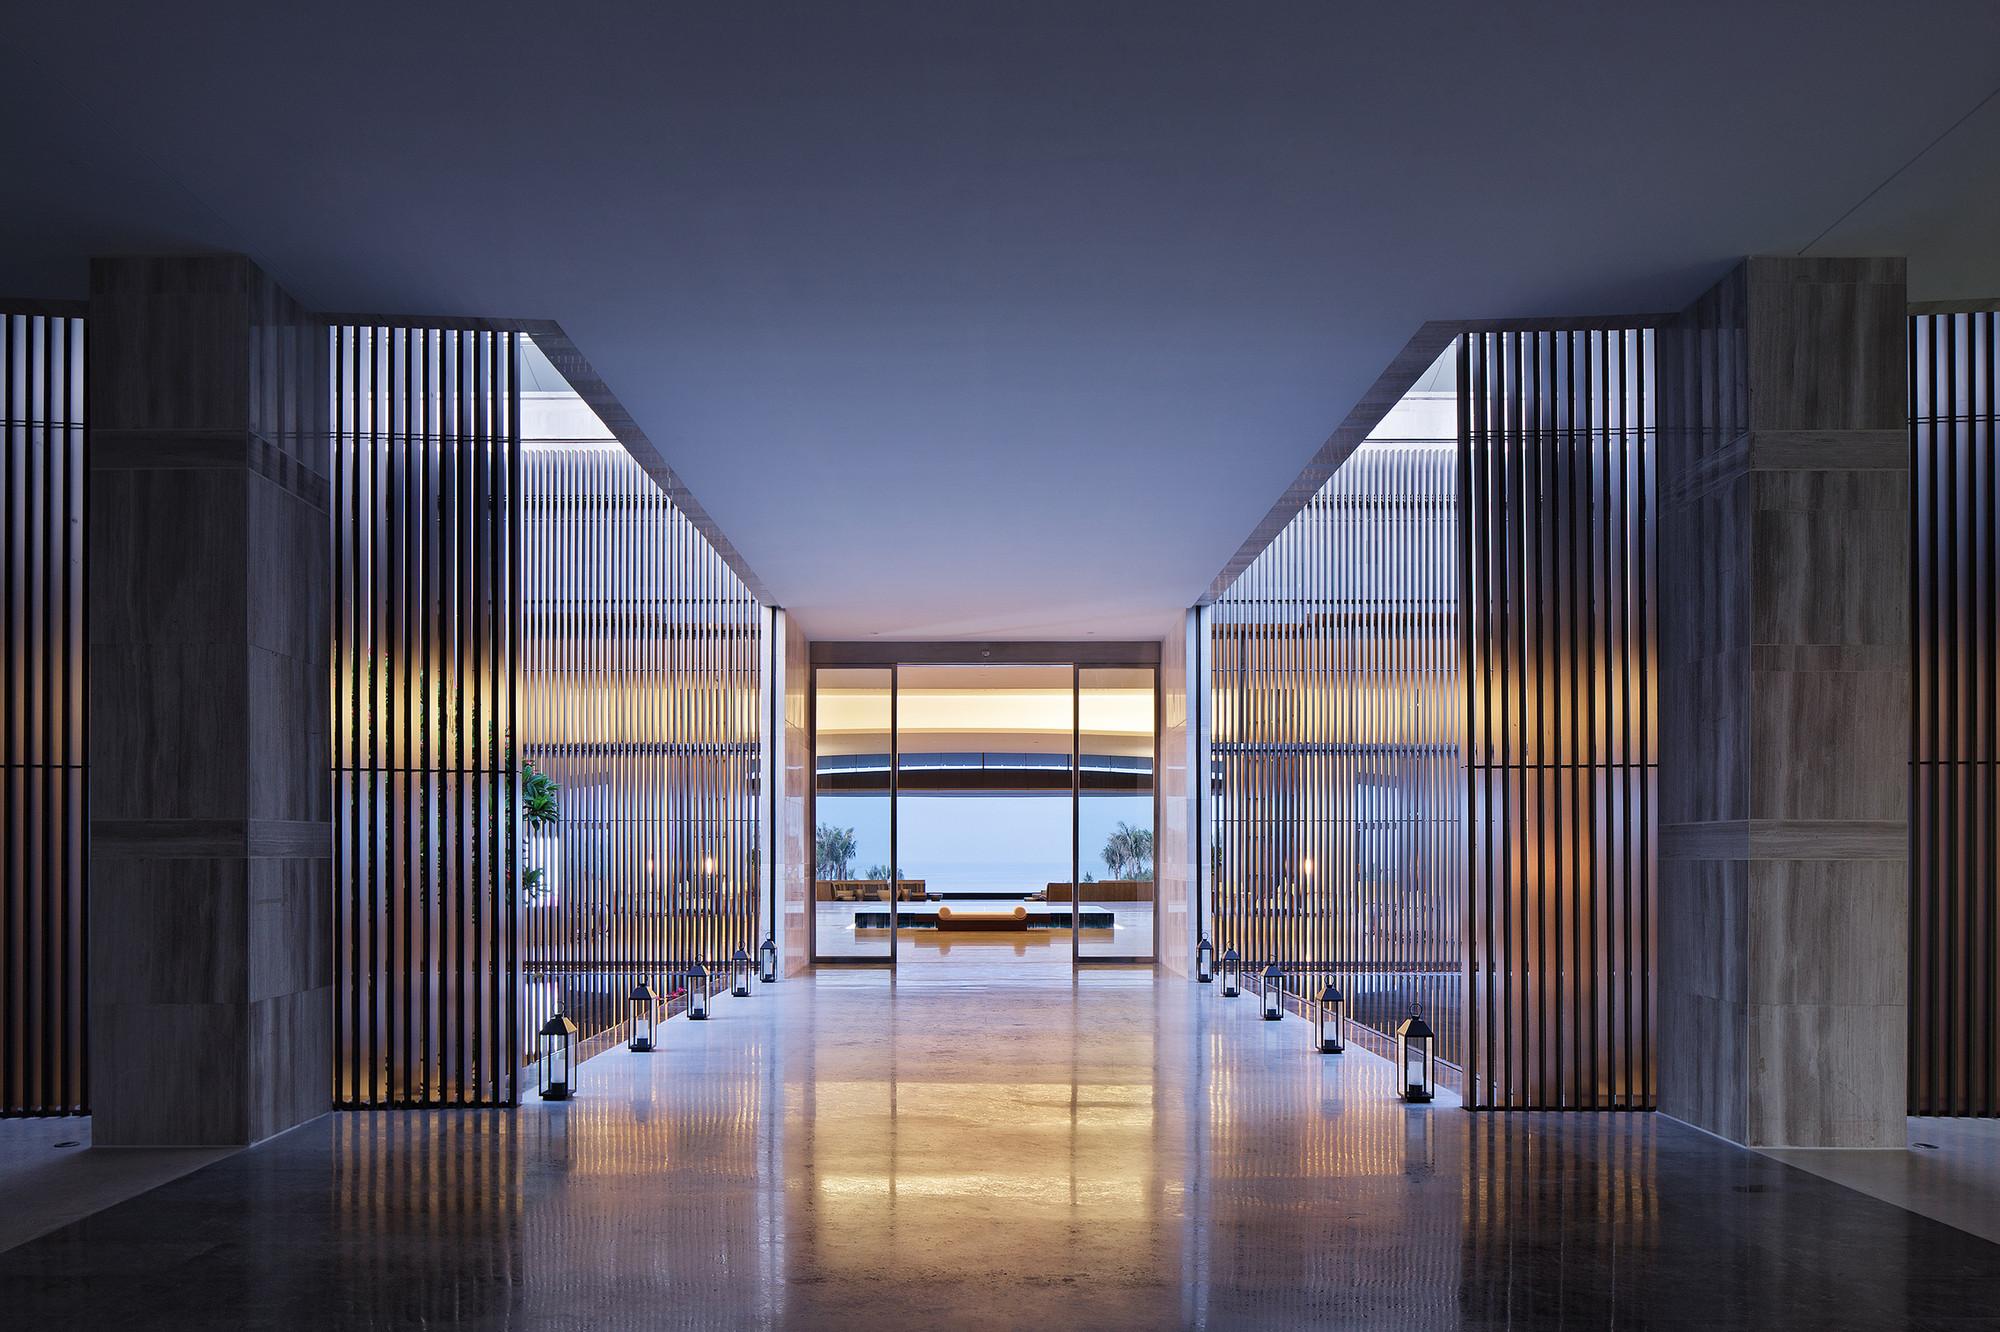 Hainan blue bay westin resort hotel gad zhejiang for Hotel architecture